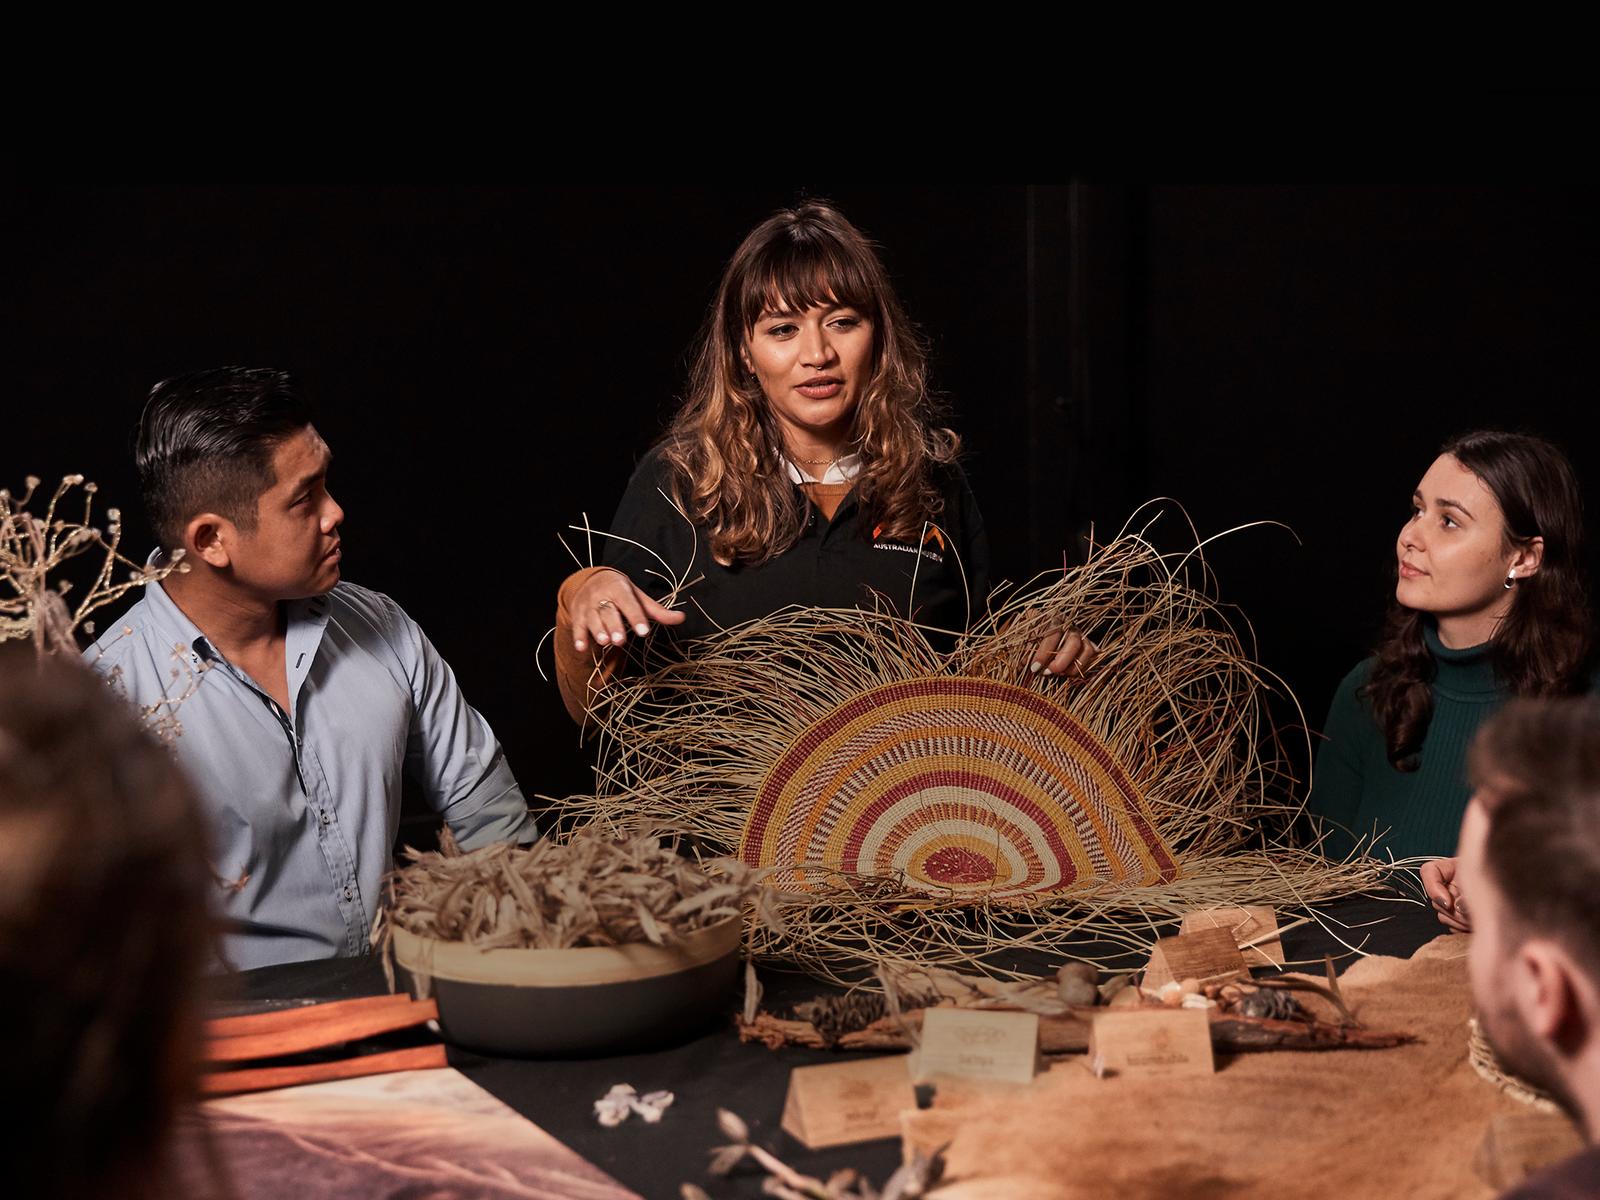 Group of people looking at weaving